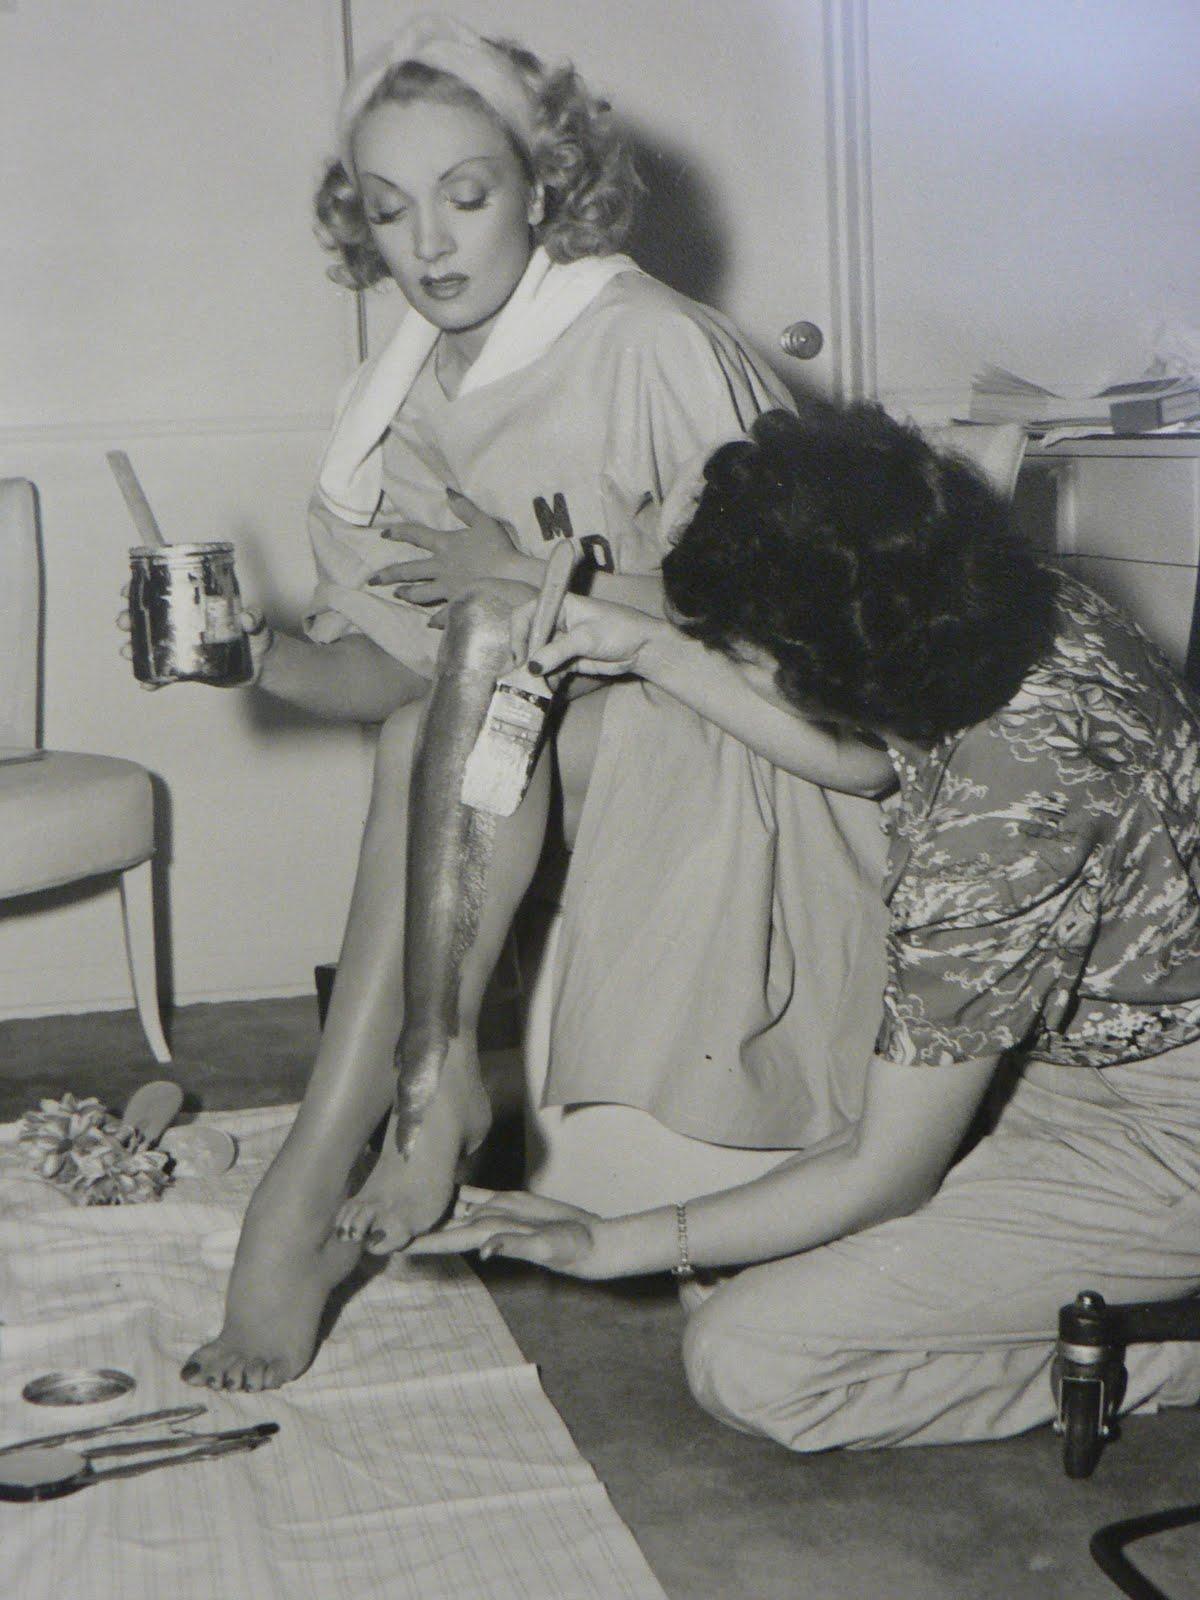 Hacked Feet Jobyna Ralston  nudes (42 fotos), Snapchat, bra